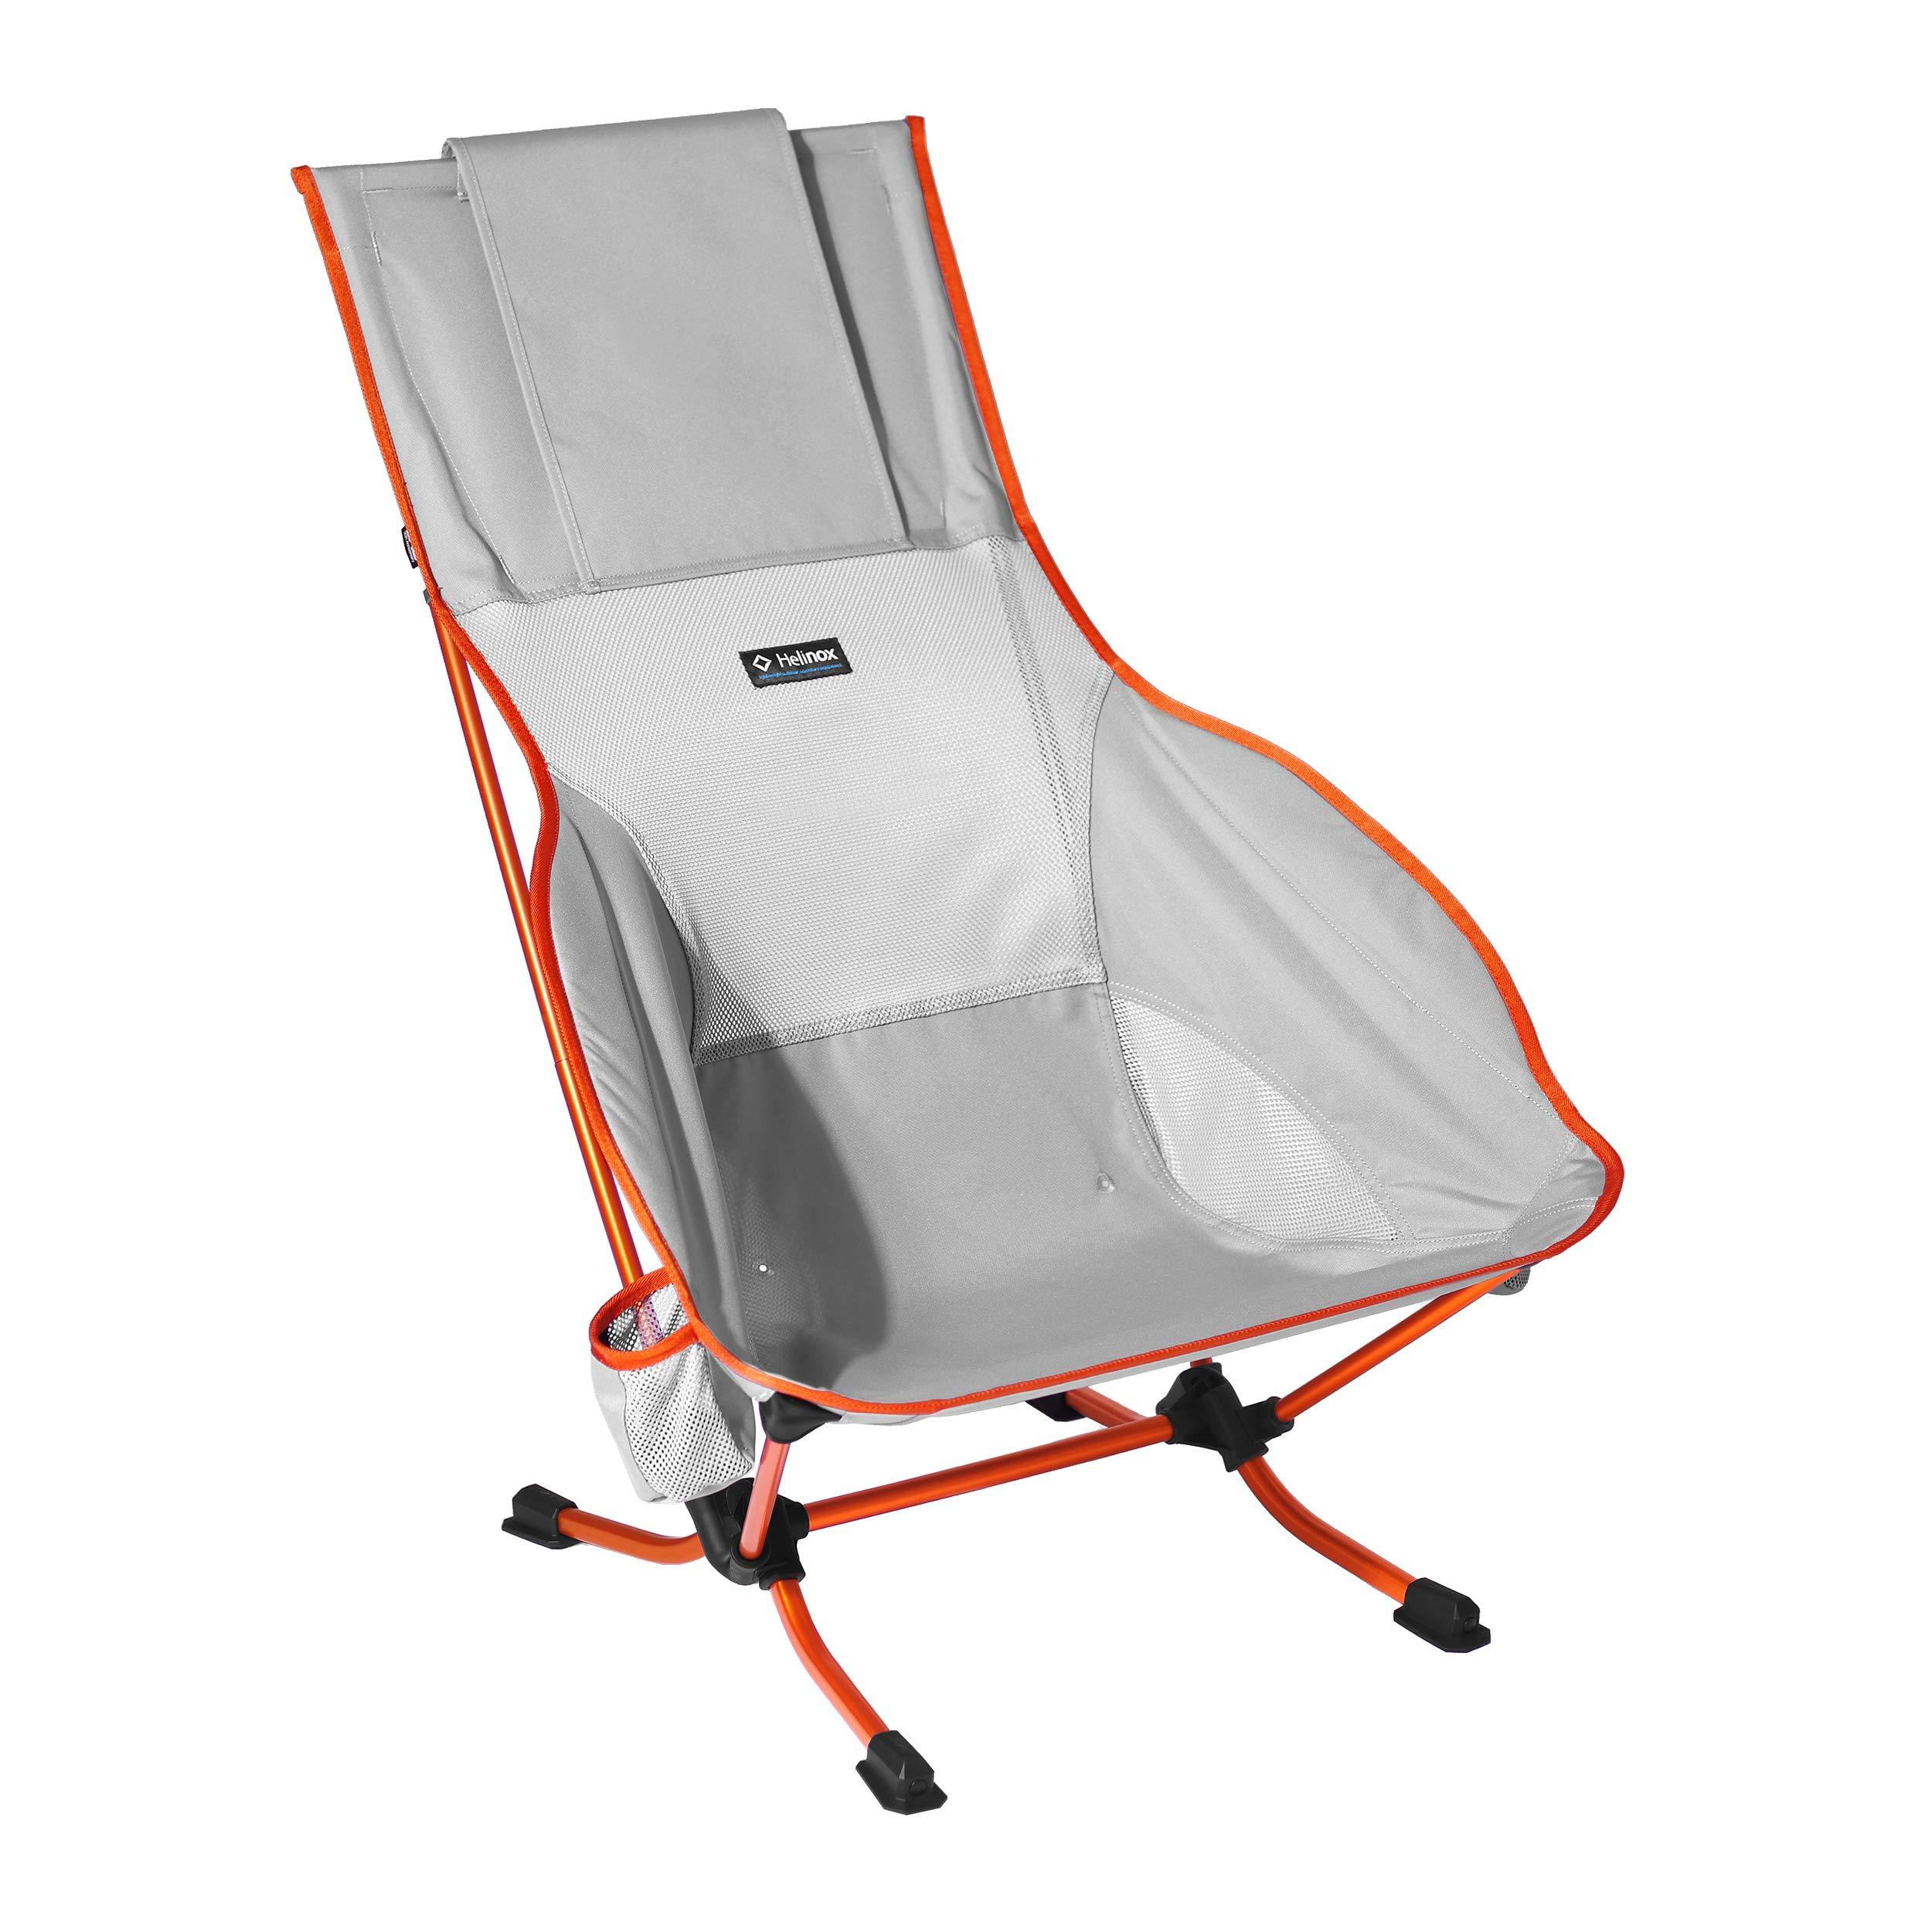 Helinox Playa Lightweight High-Back Collapsible Beach Chair, Grey